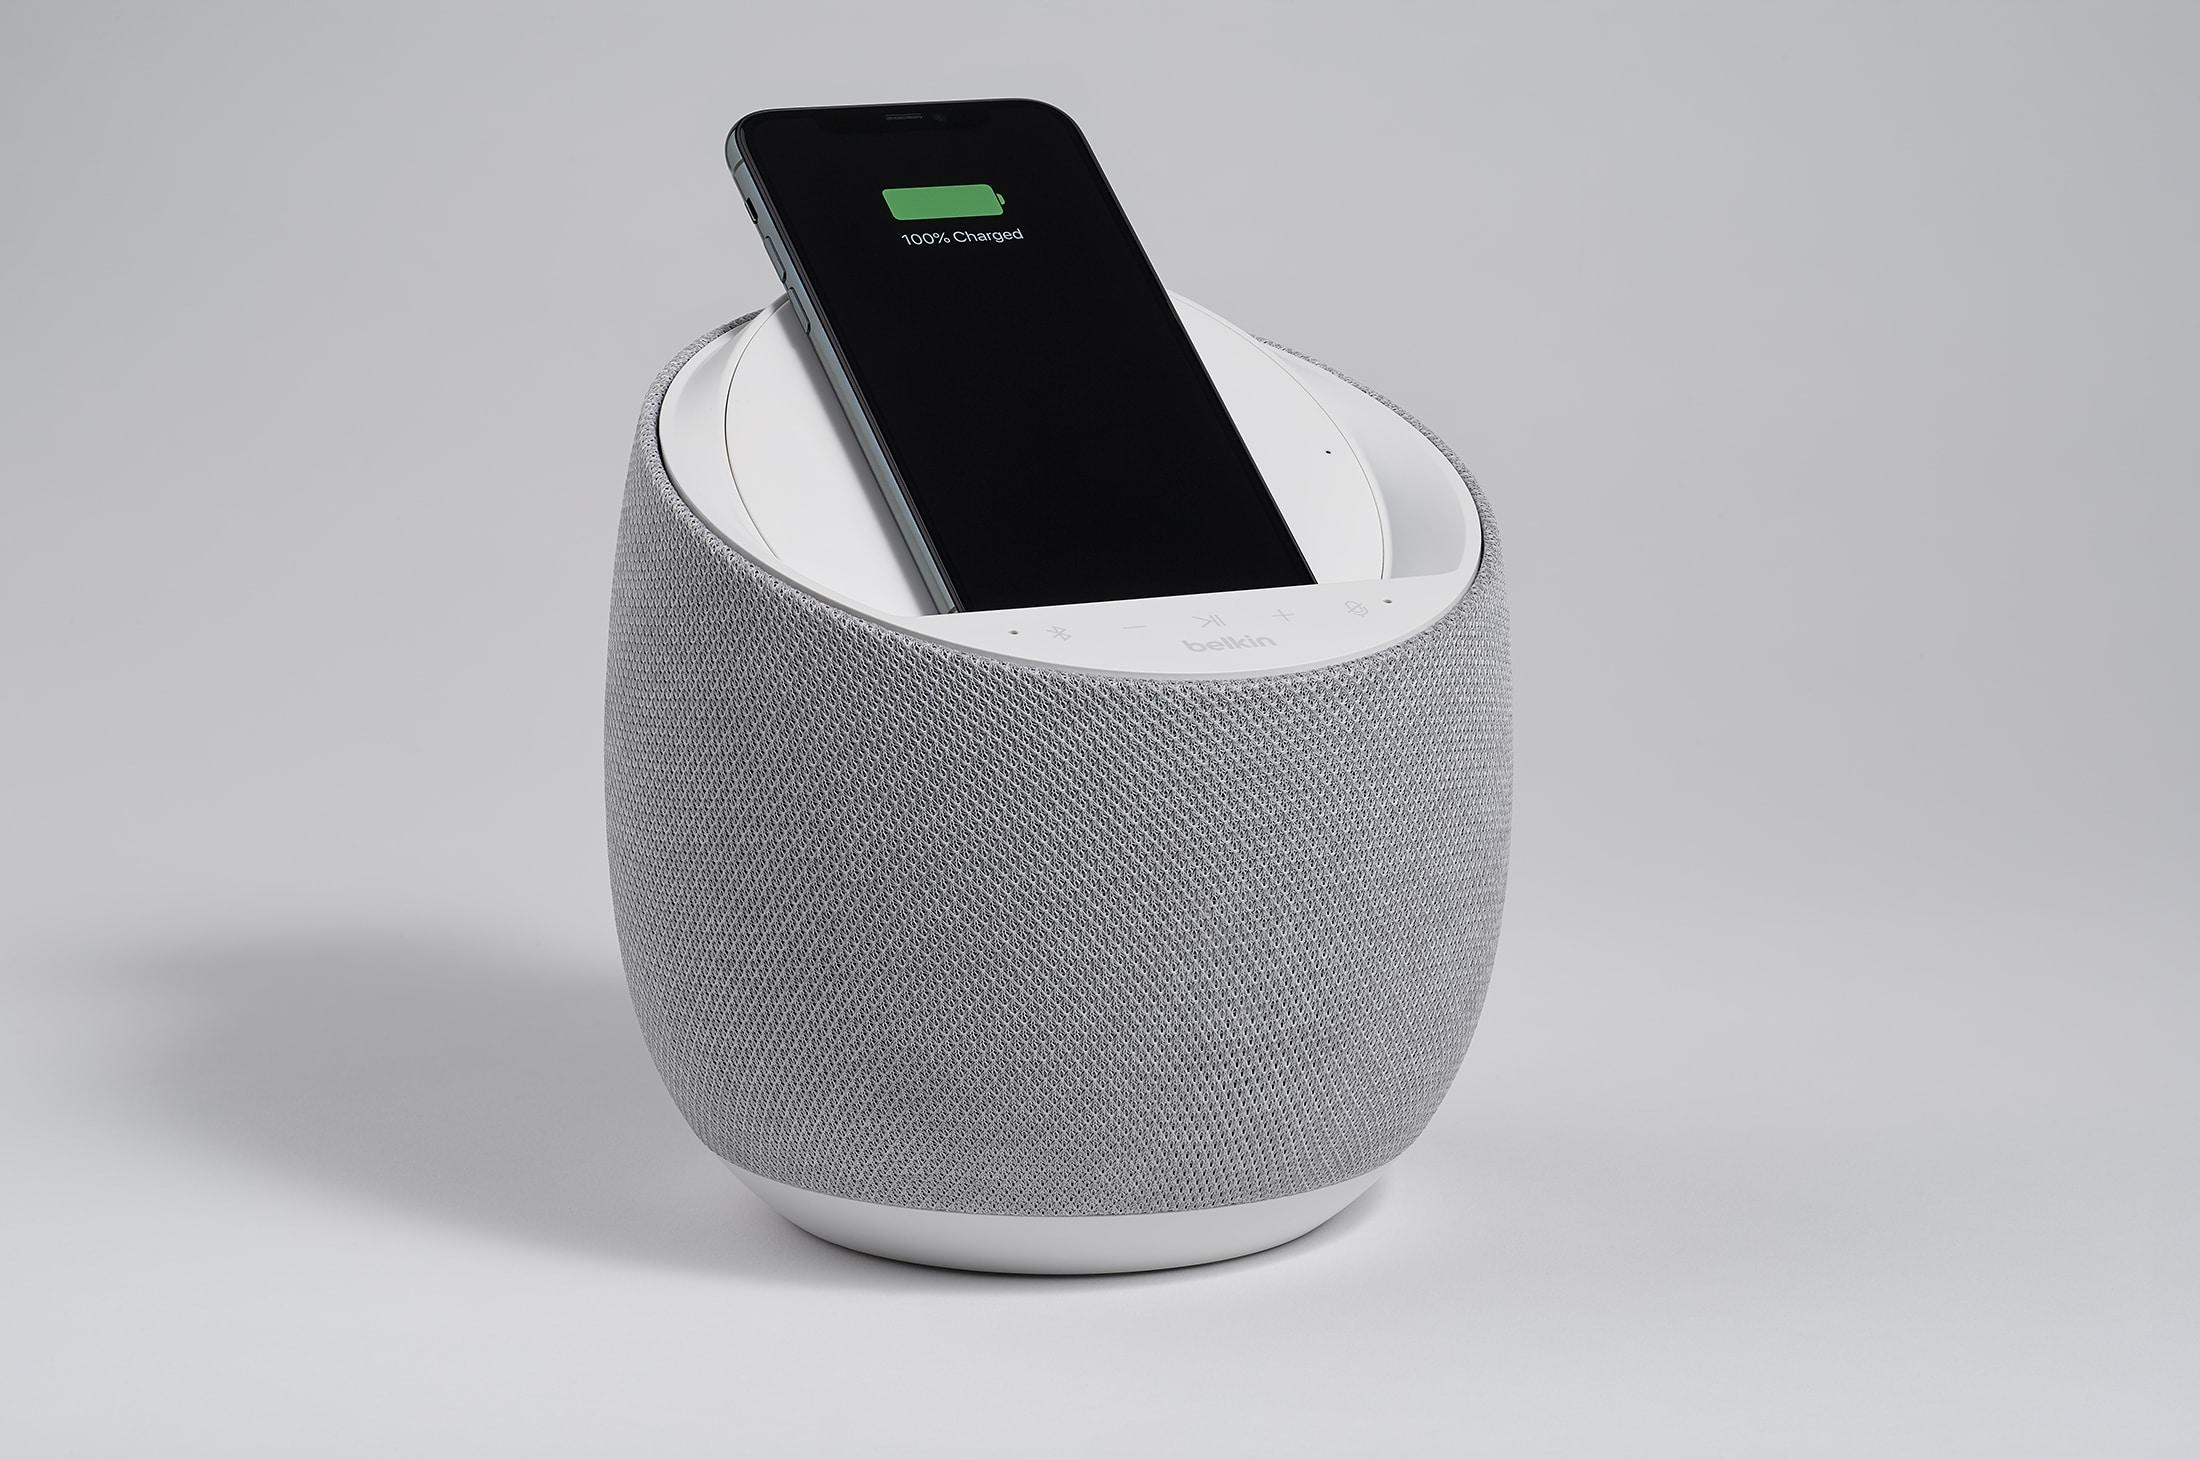 Alto-falante inteligente Belkin Soundform Elite Hi-FI